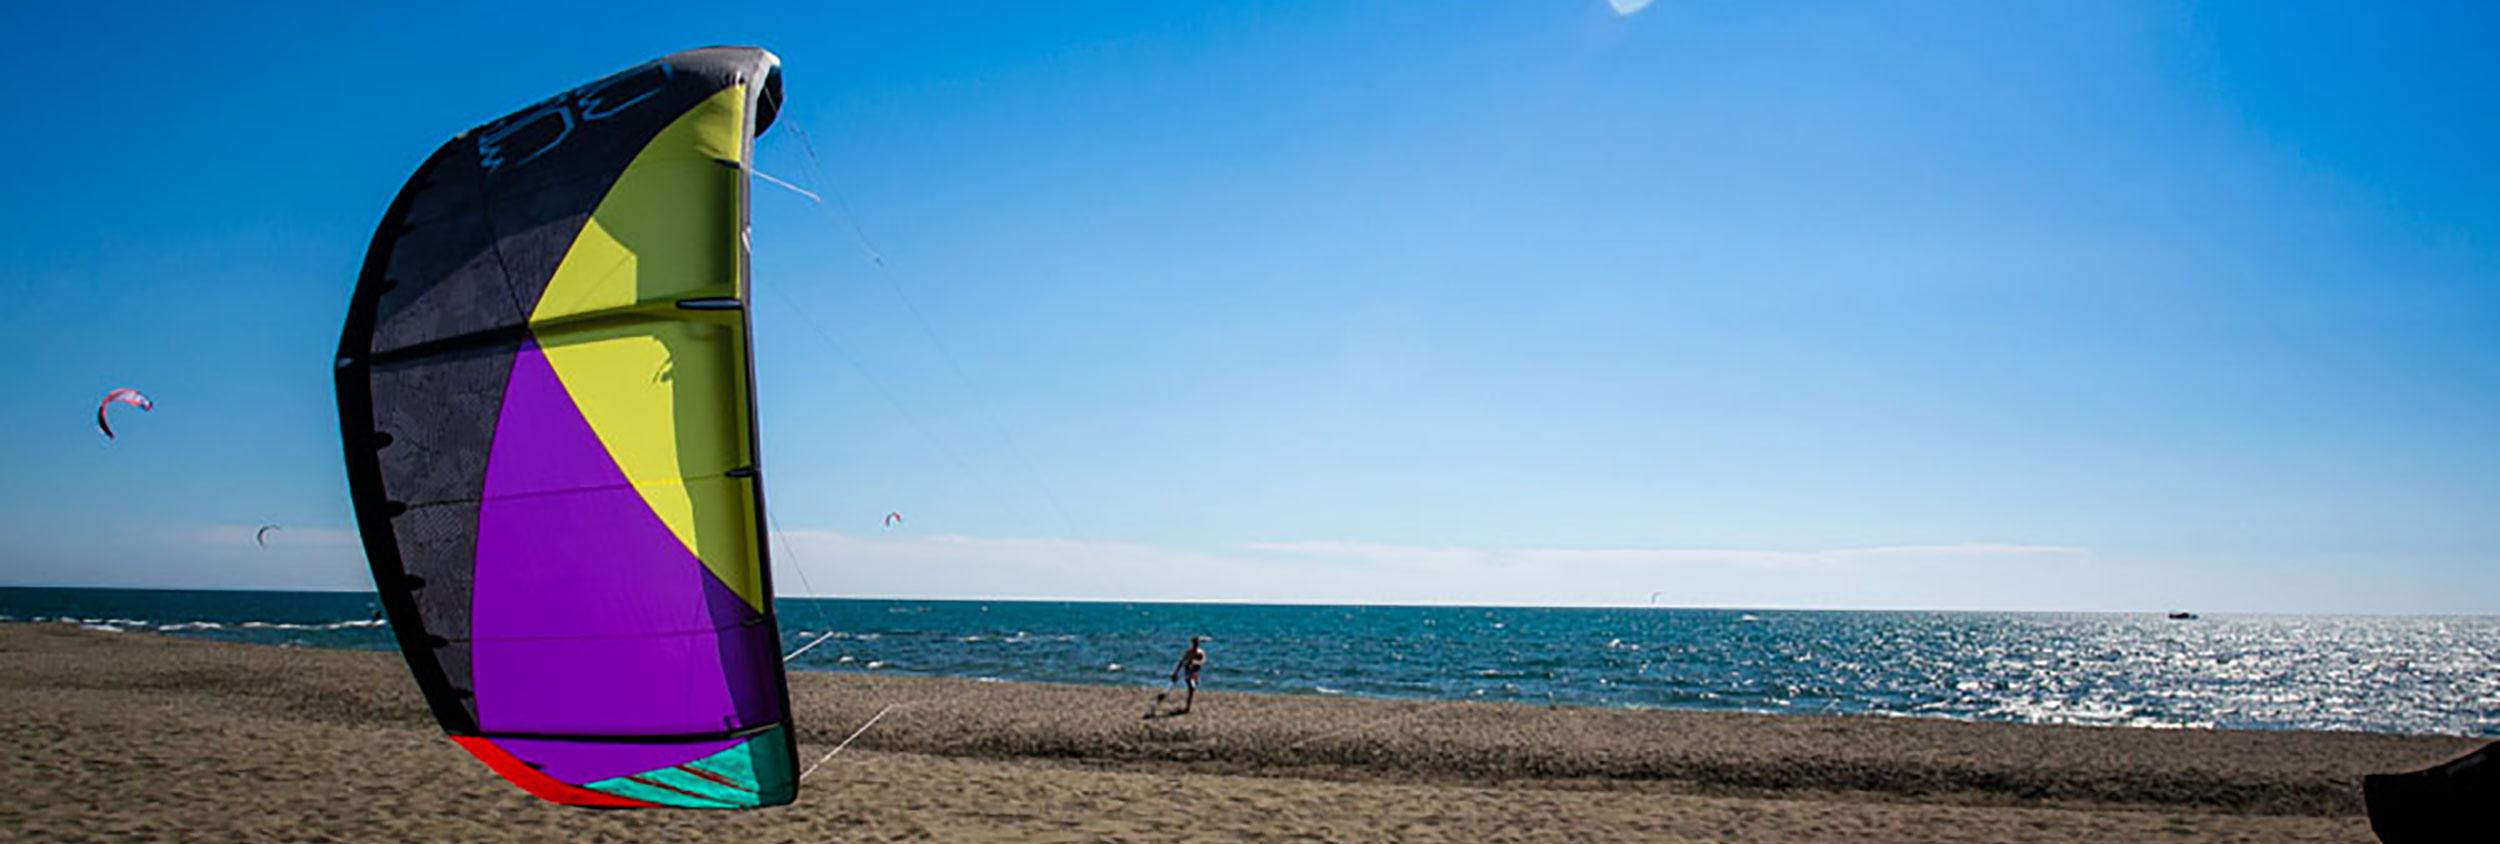 Kitesurfing in Ulcinj, Montenegro by KiteWorldWide